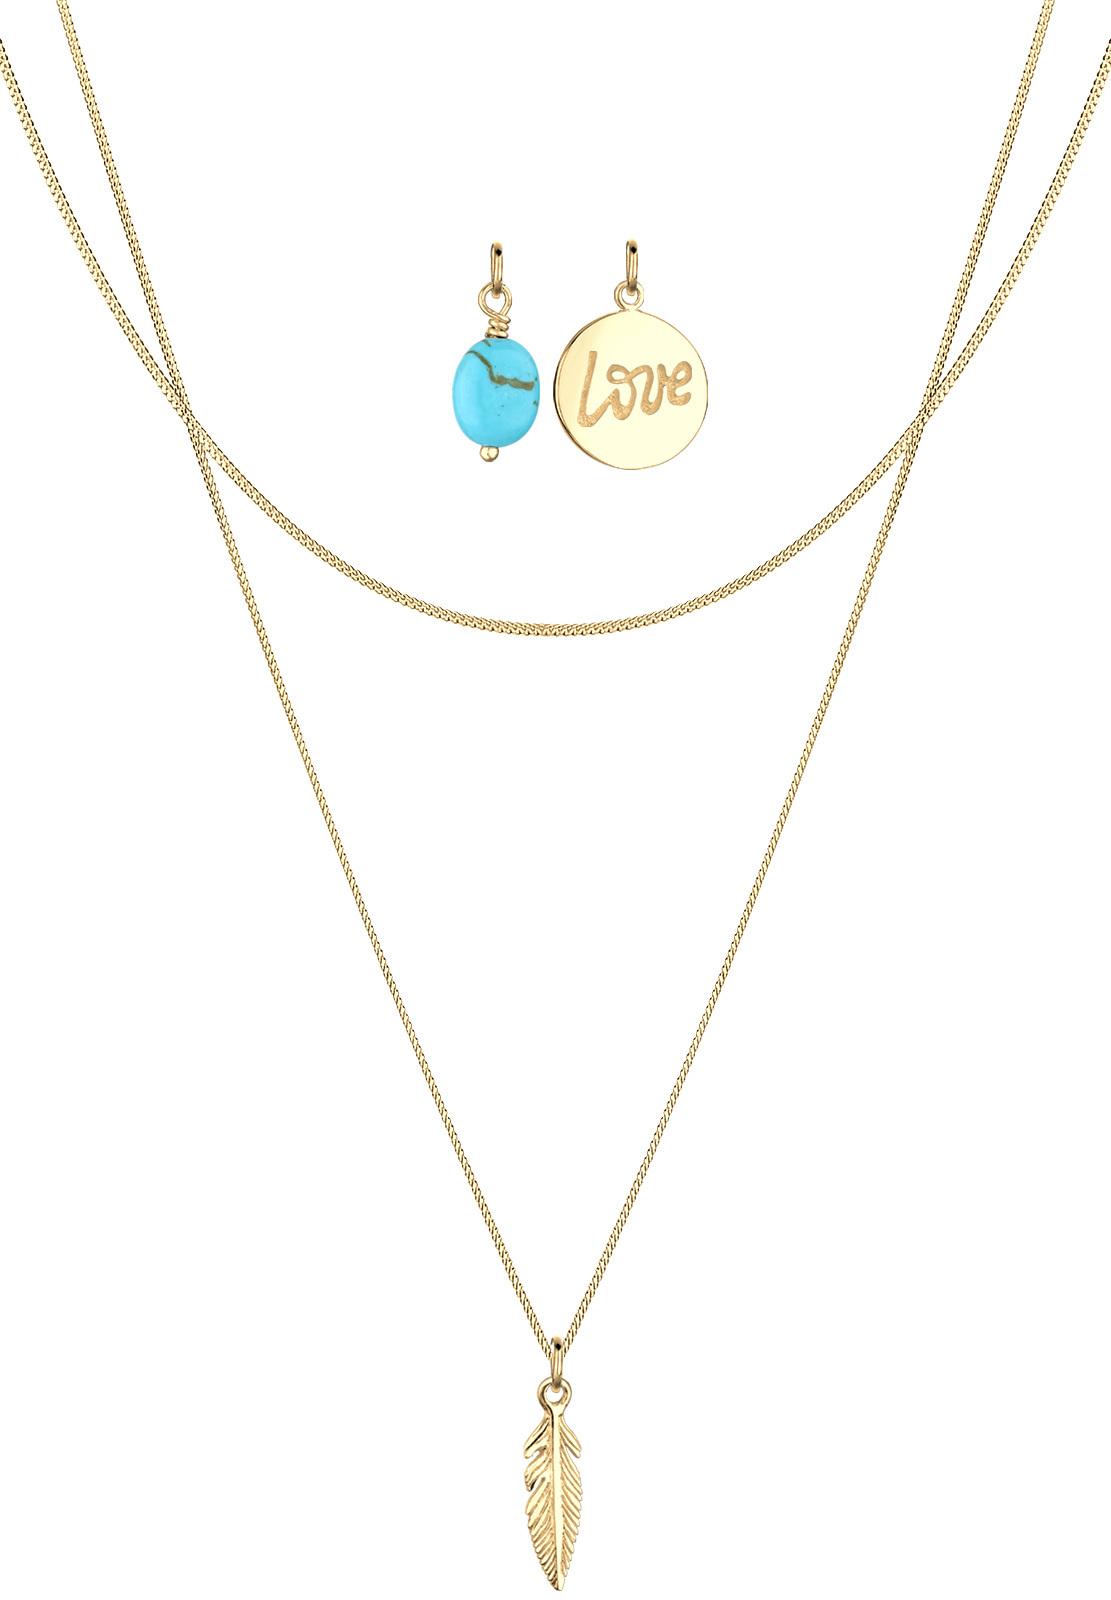 Halskettenset Feder   Howlith ( Türkis )   925 Sterling Silber vergoldet